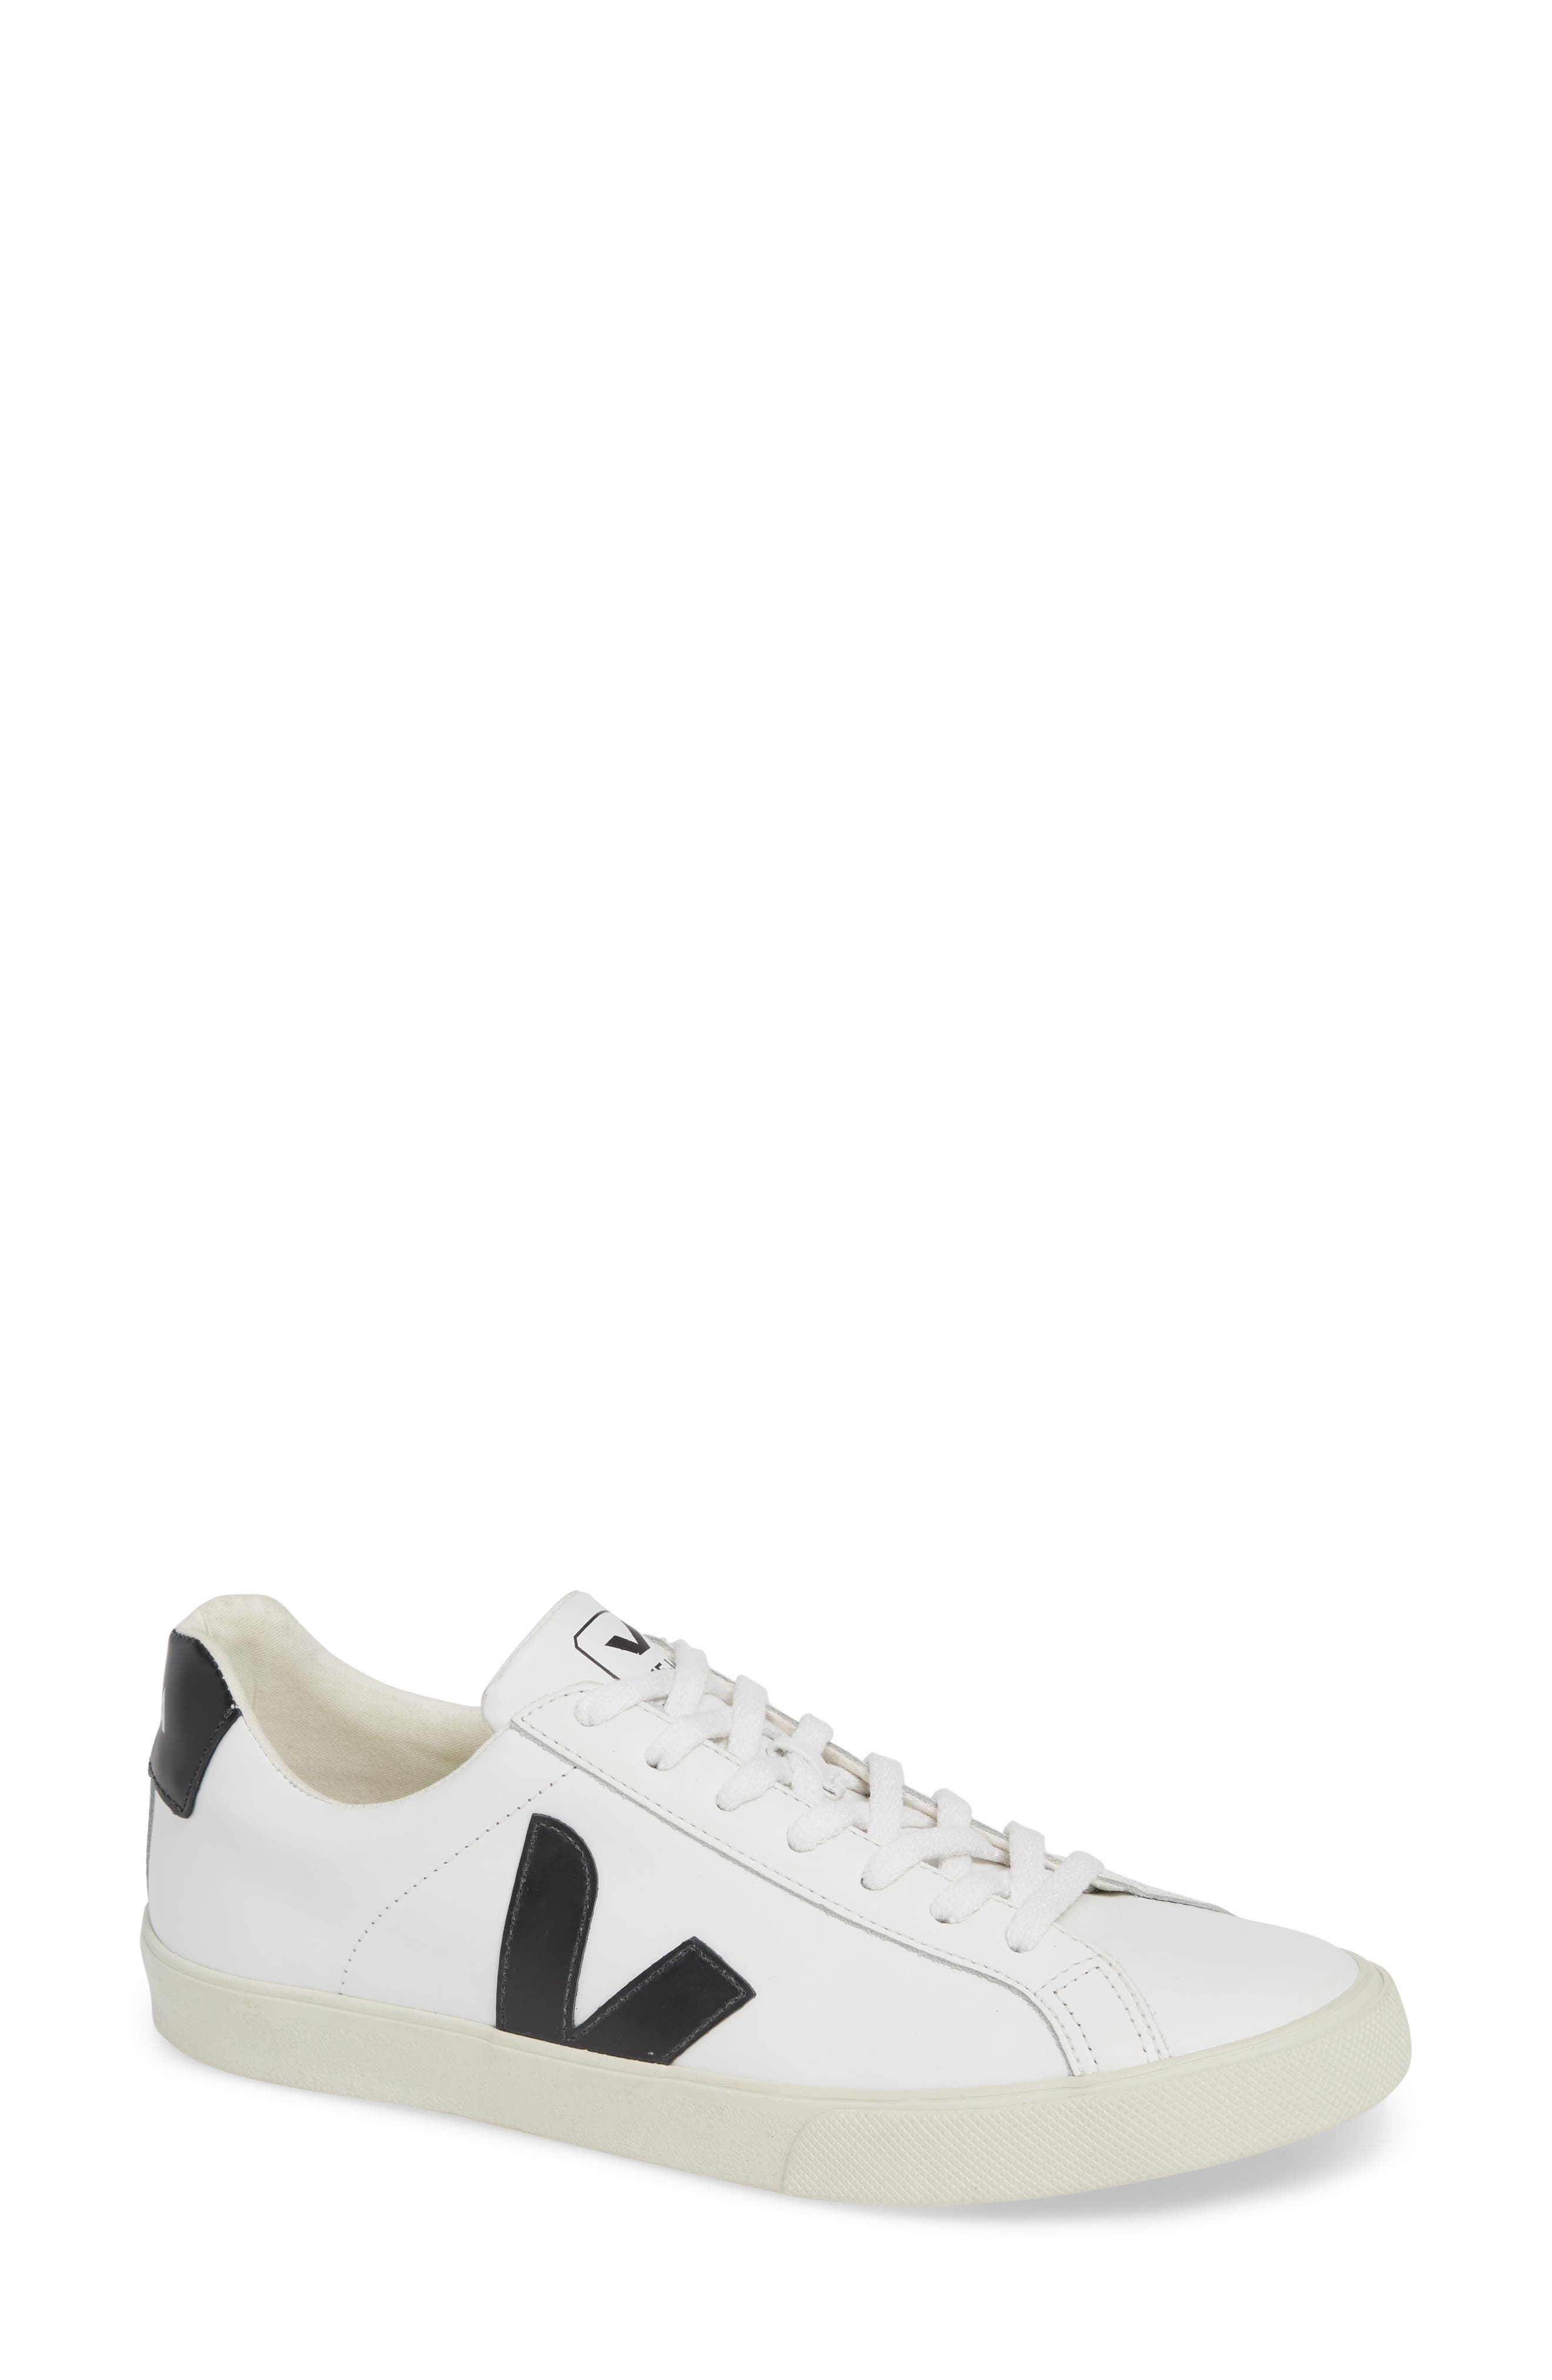 VEJA, Esplar Sneaker, Main thumbnail 1, color, EXTRA WHITE BLACK